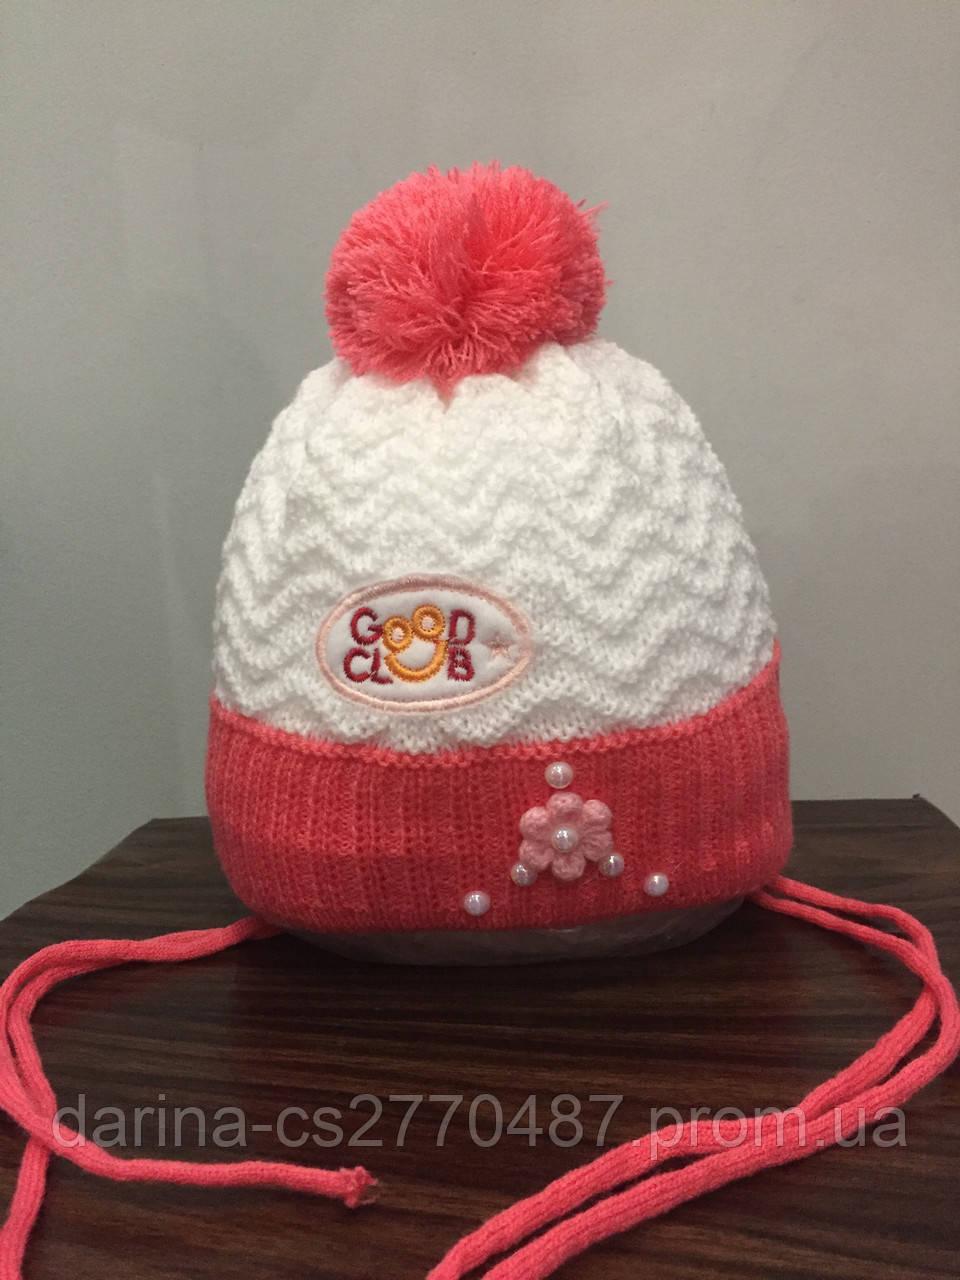 Зимняя шапка для девочки на завязках